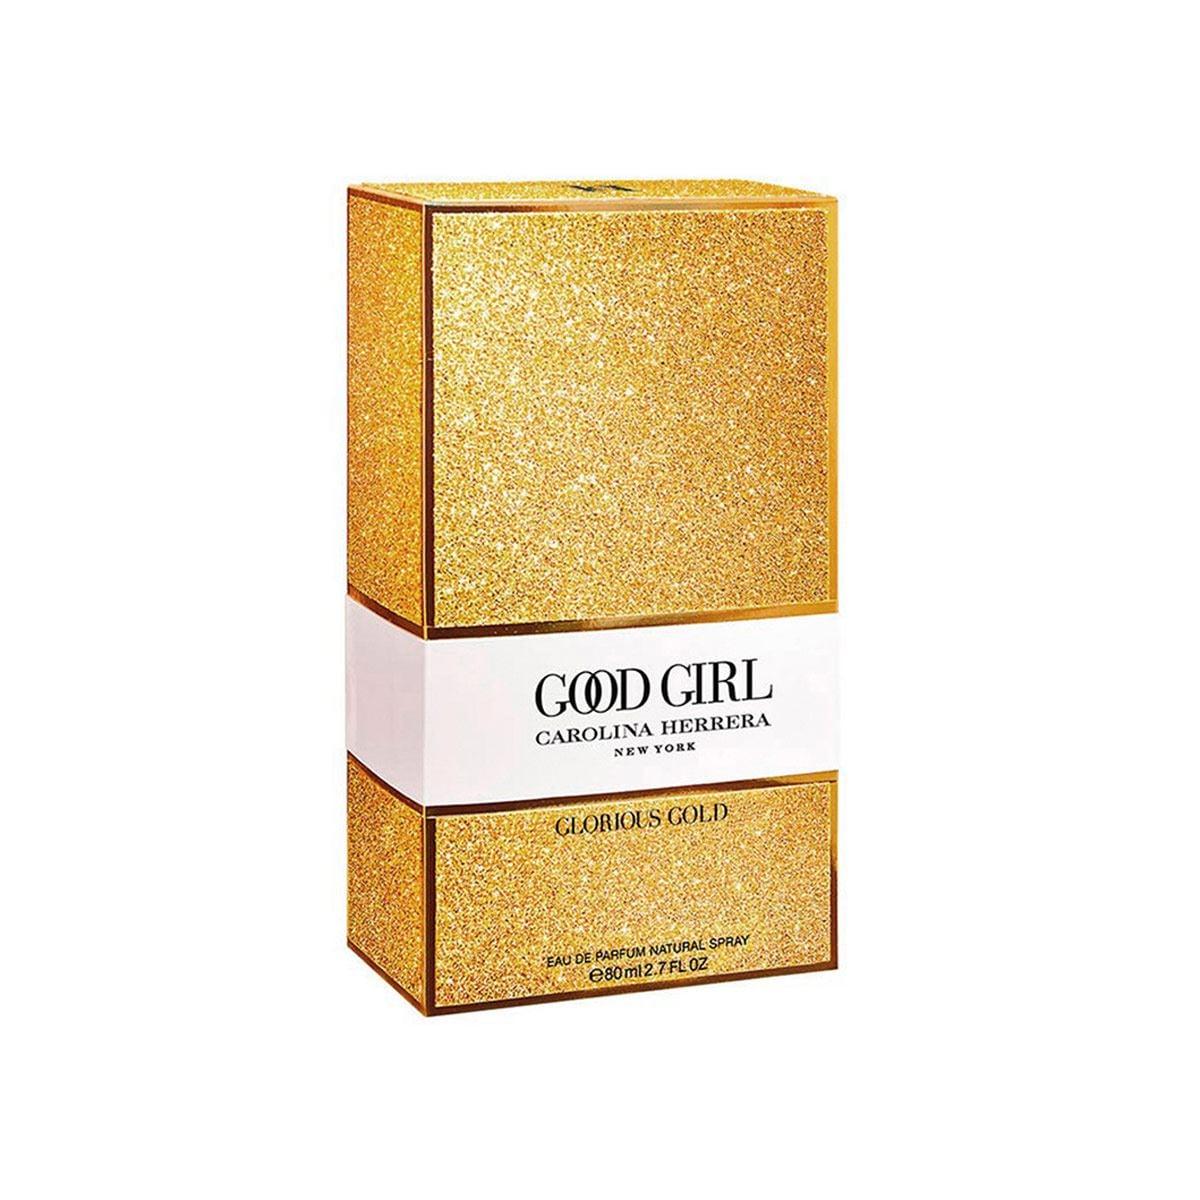 Fragancia para Dama Good Girl Glorious Gold Carolina Herrera